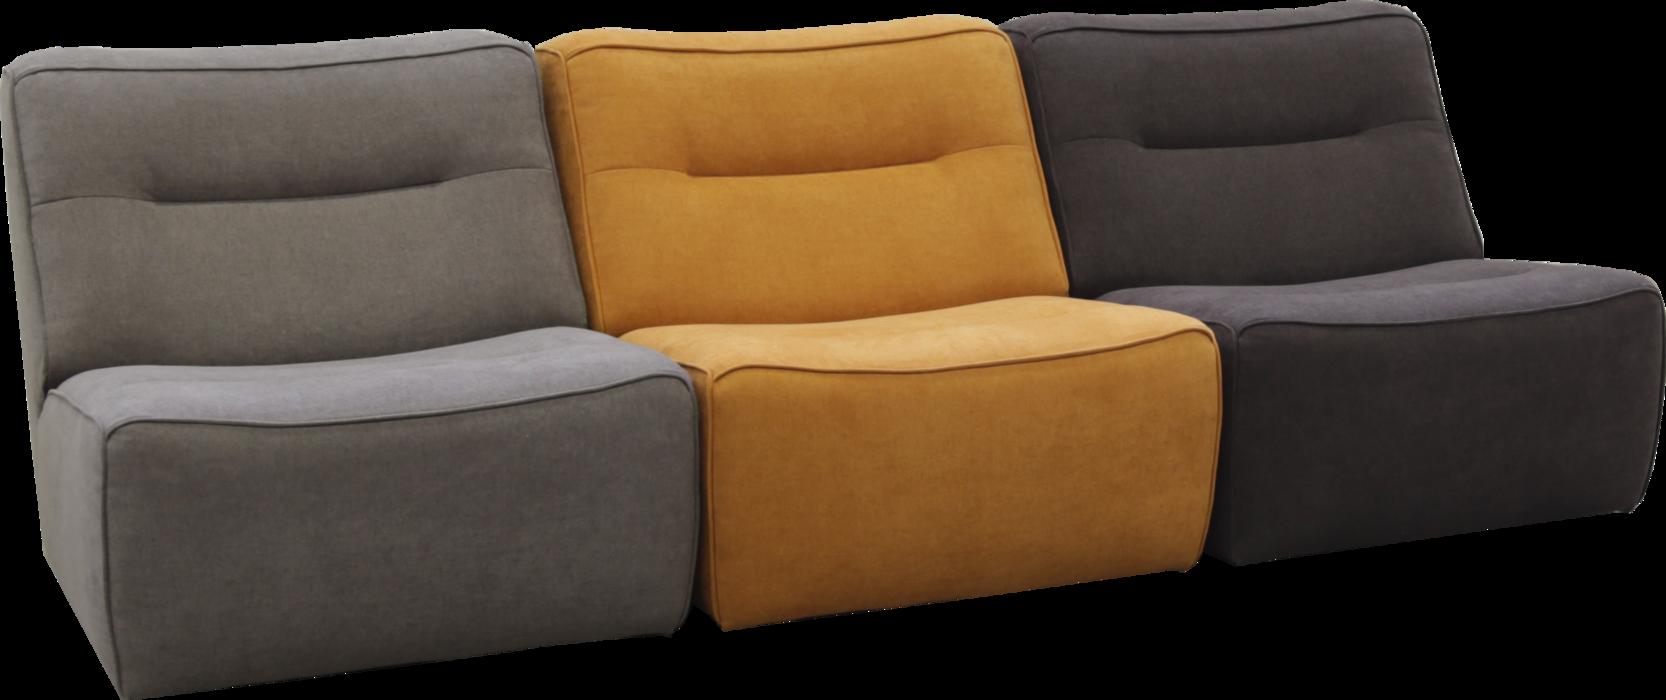 Arena Luonto Furniture